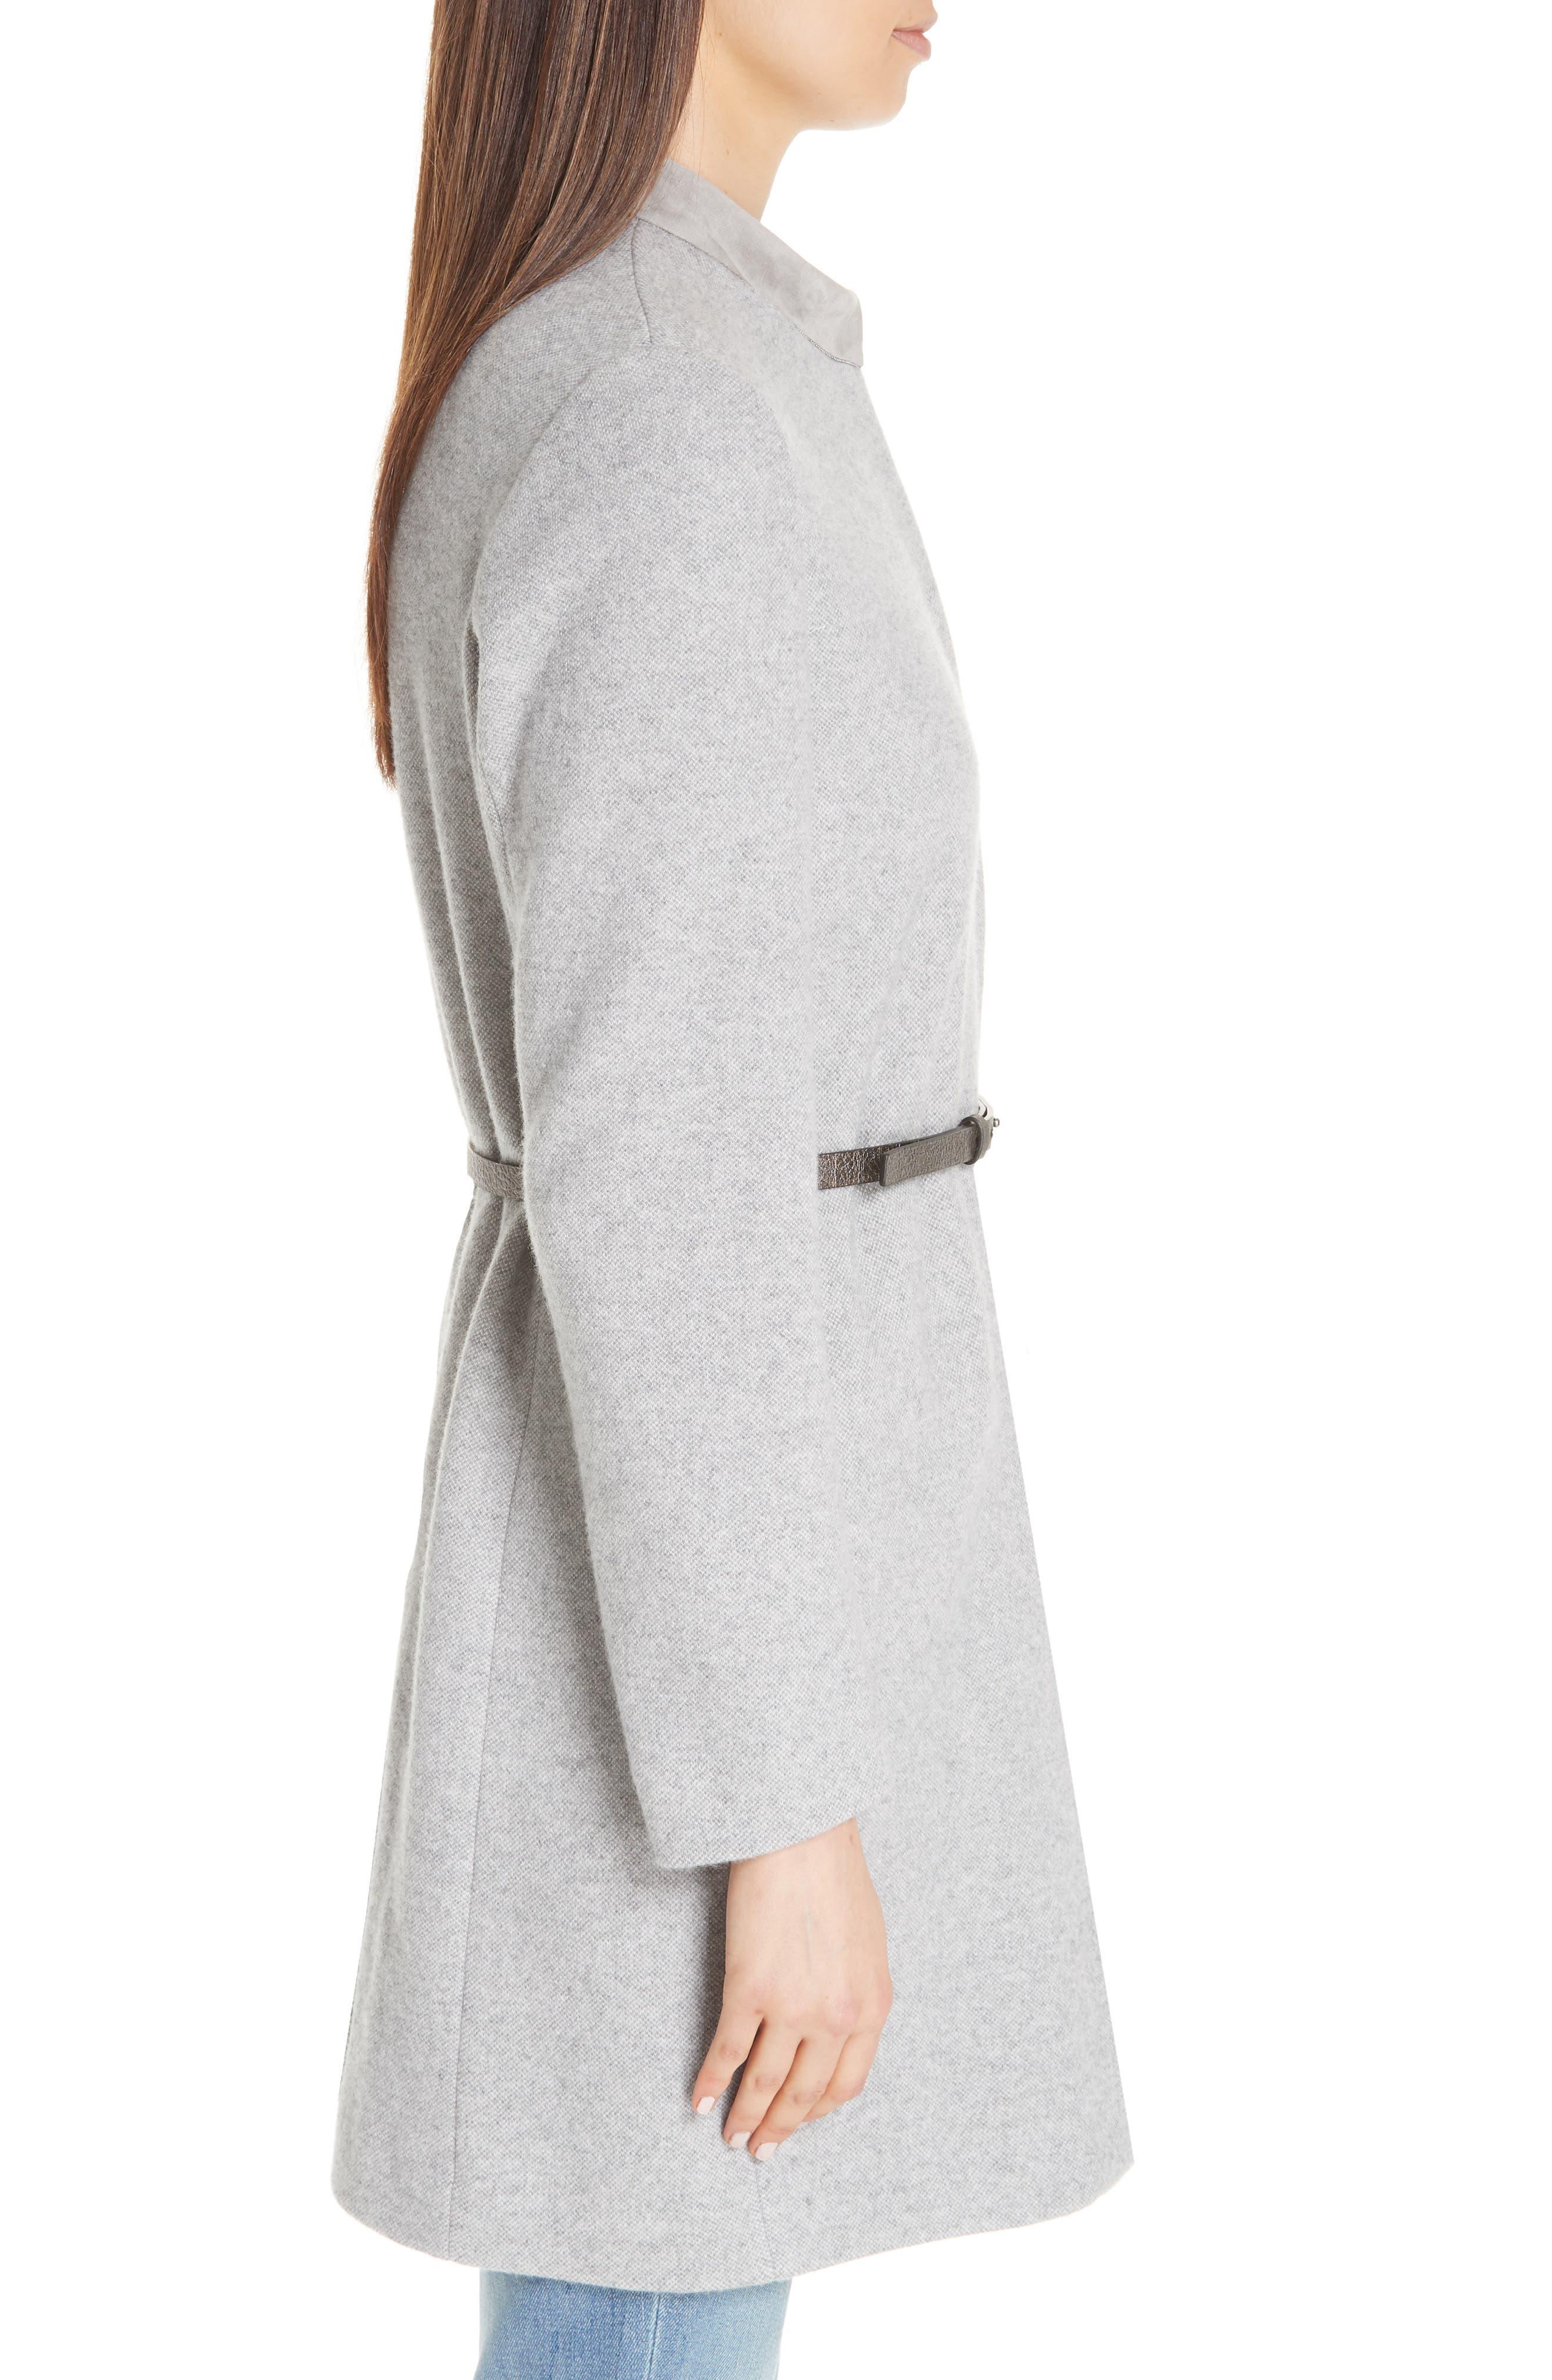 FABIANA FILIPPI,                             Suede Trim Tweed Jacket,                             Alternate thumbnail 3, color,                             GREY